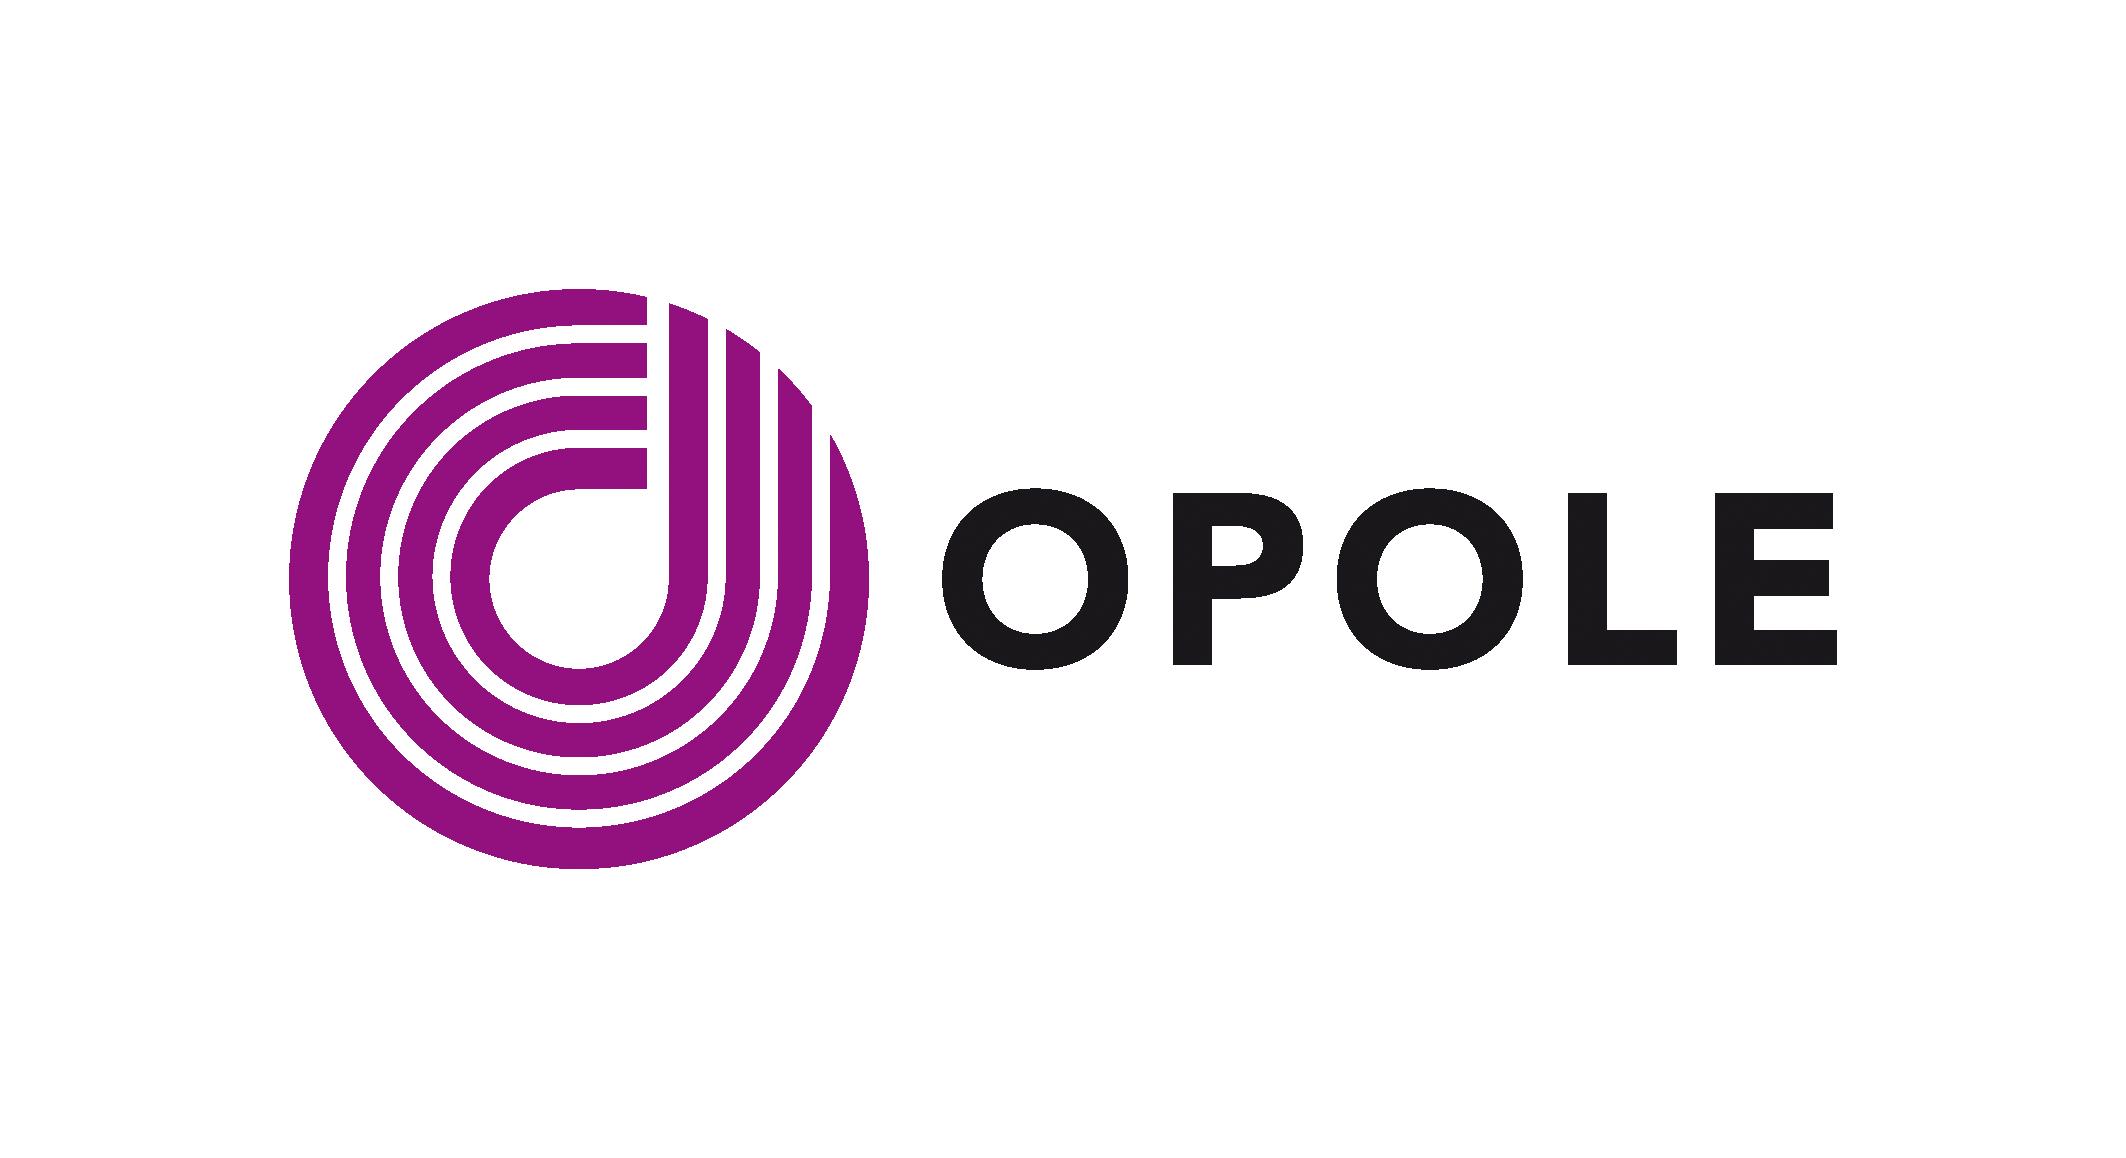 LOGO-OPOLA-SPORT_